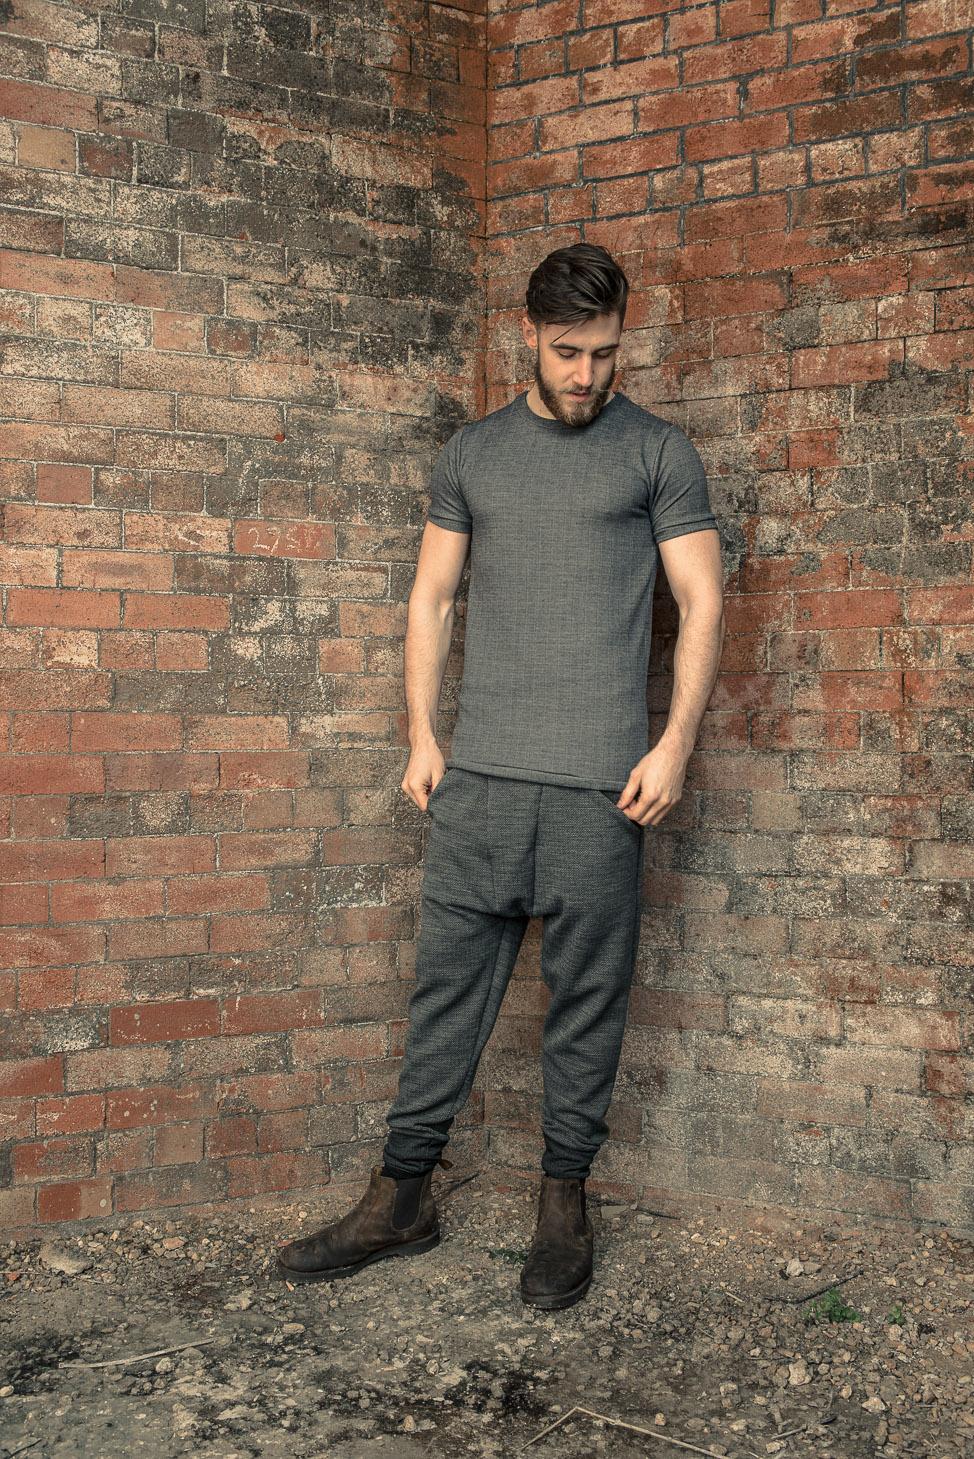 zaramia-ava-zaramiaava-leeds-fashion-designer-ethical-sustainable-tailored-minimalist-fitted-versatile-drape-koji-grey-tshirt-top-hareem-trousers-black-grey-texture-styling-menswear-model-20